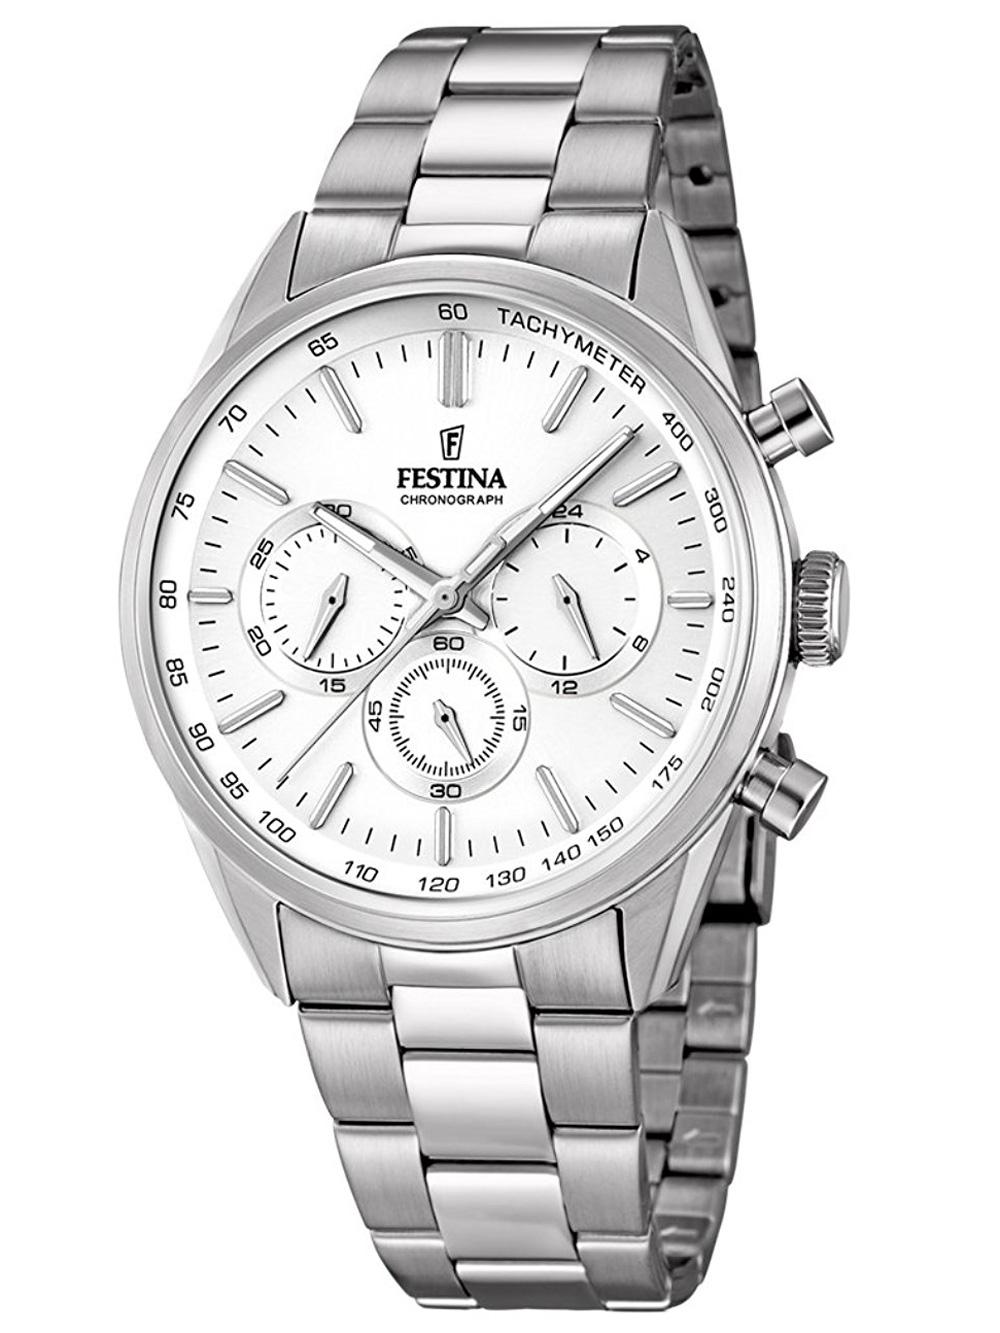 Festina F16820 1 Sport Chronograph 44mm 5ATM